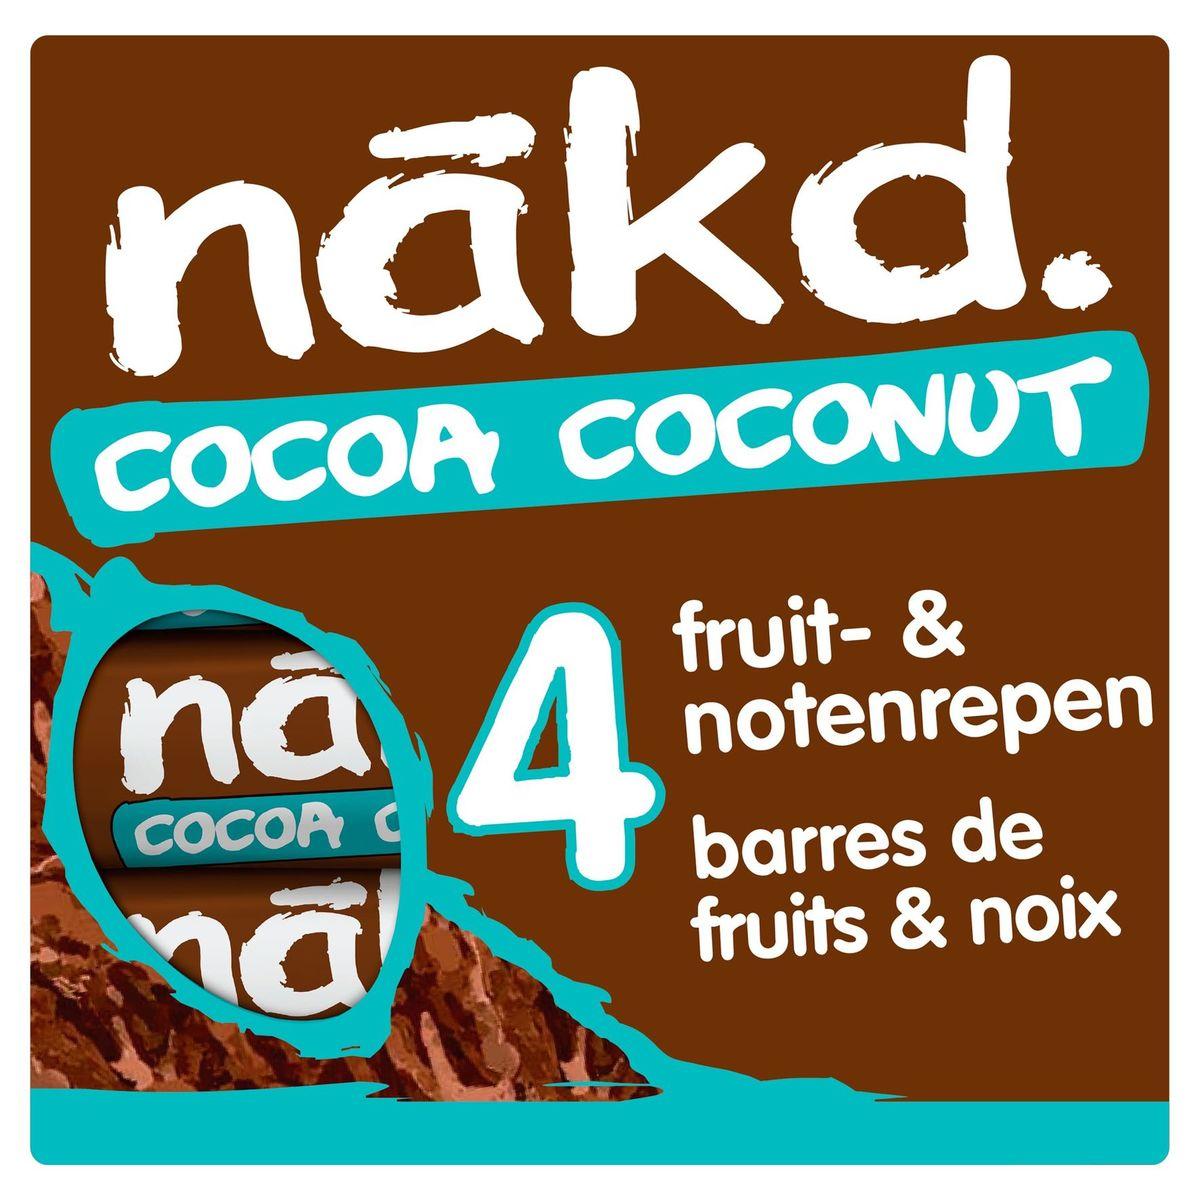 Nākd Cocoa Coconut 4 x 35 g